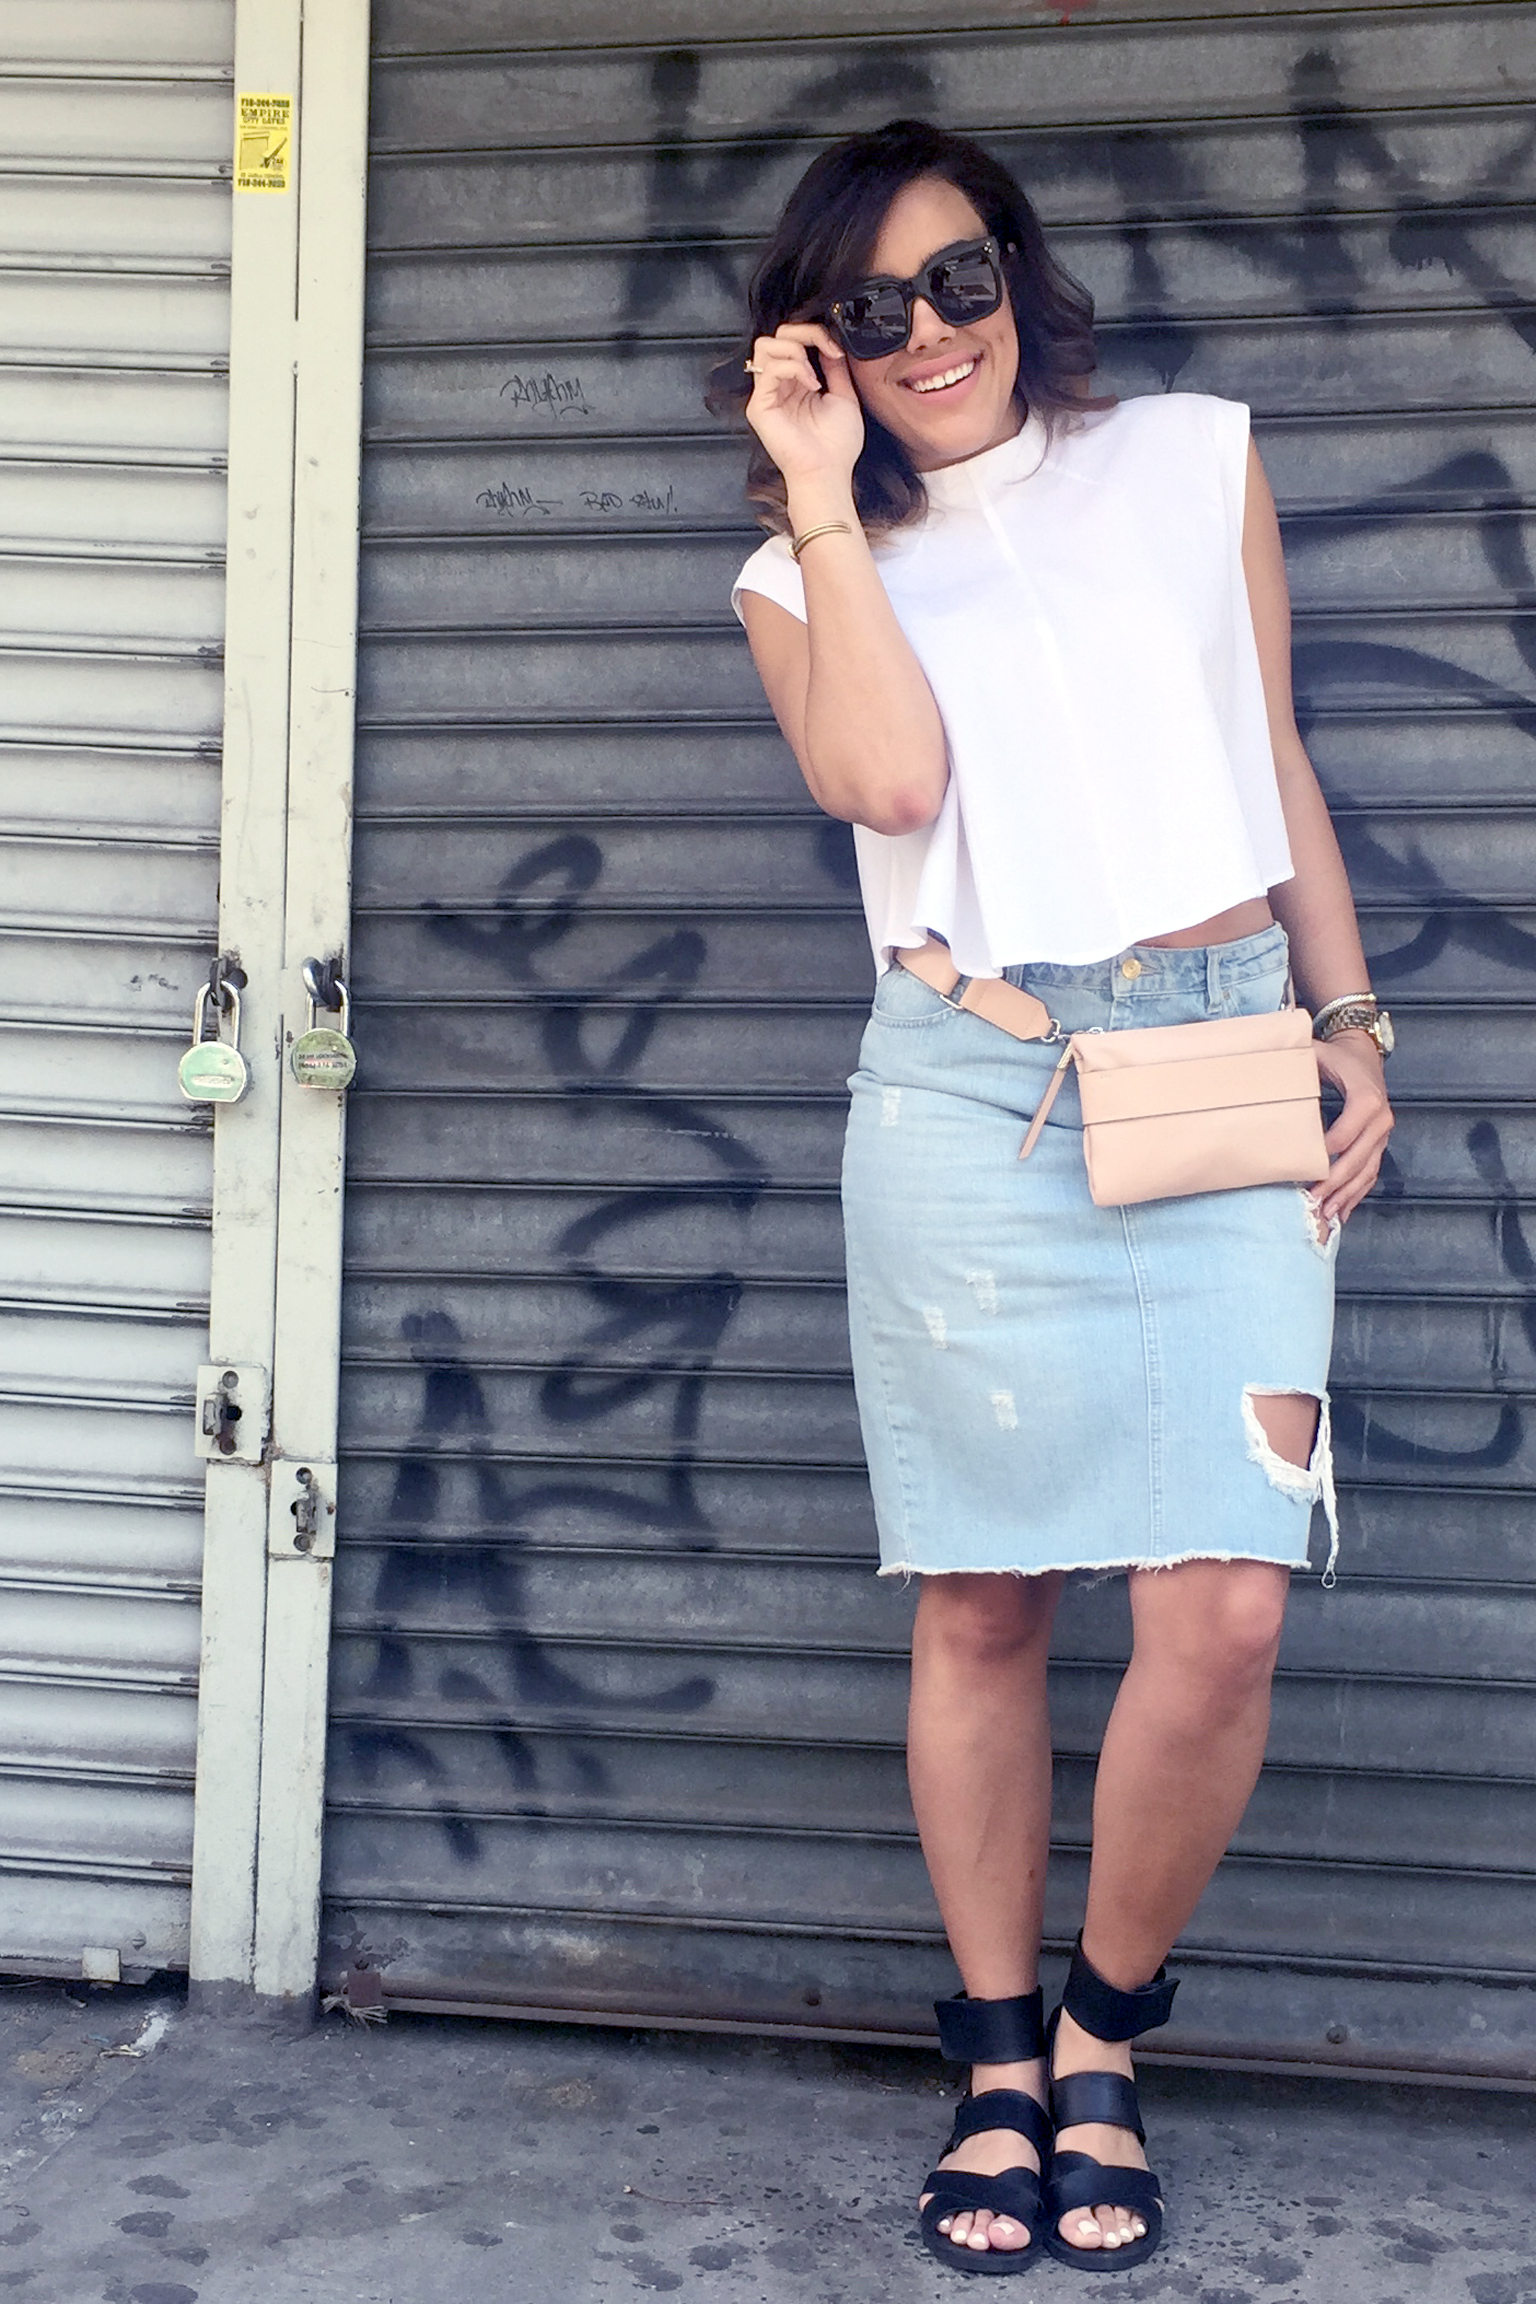 how-to-wear-denim-pencil-skirt-cropped-boxy-shirt-fanny-pack-summer-fashion.jpg